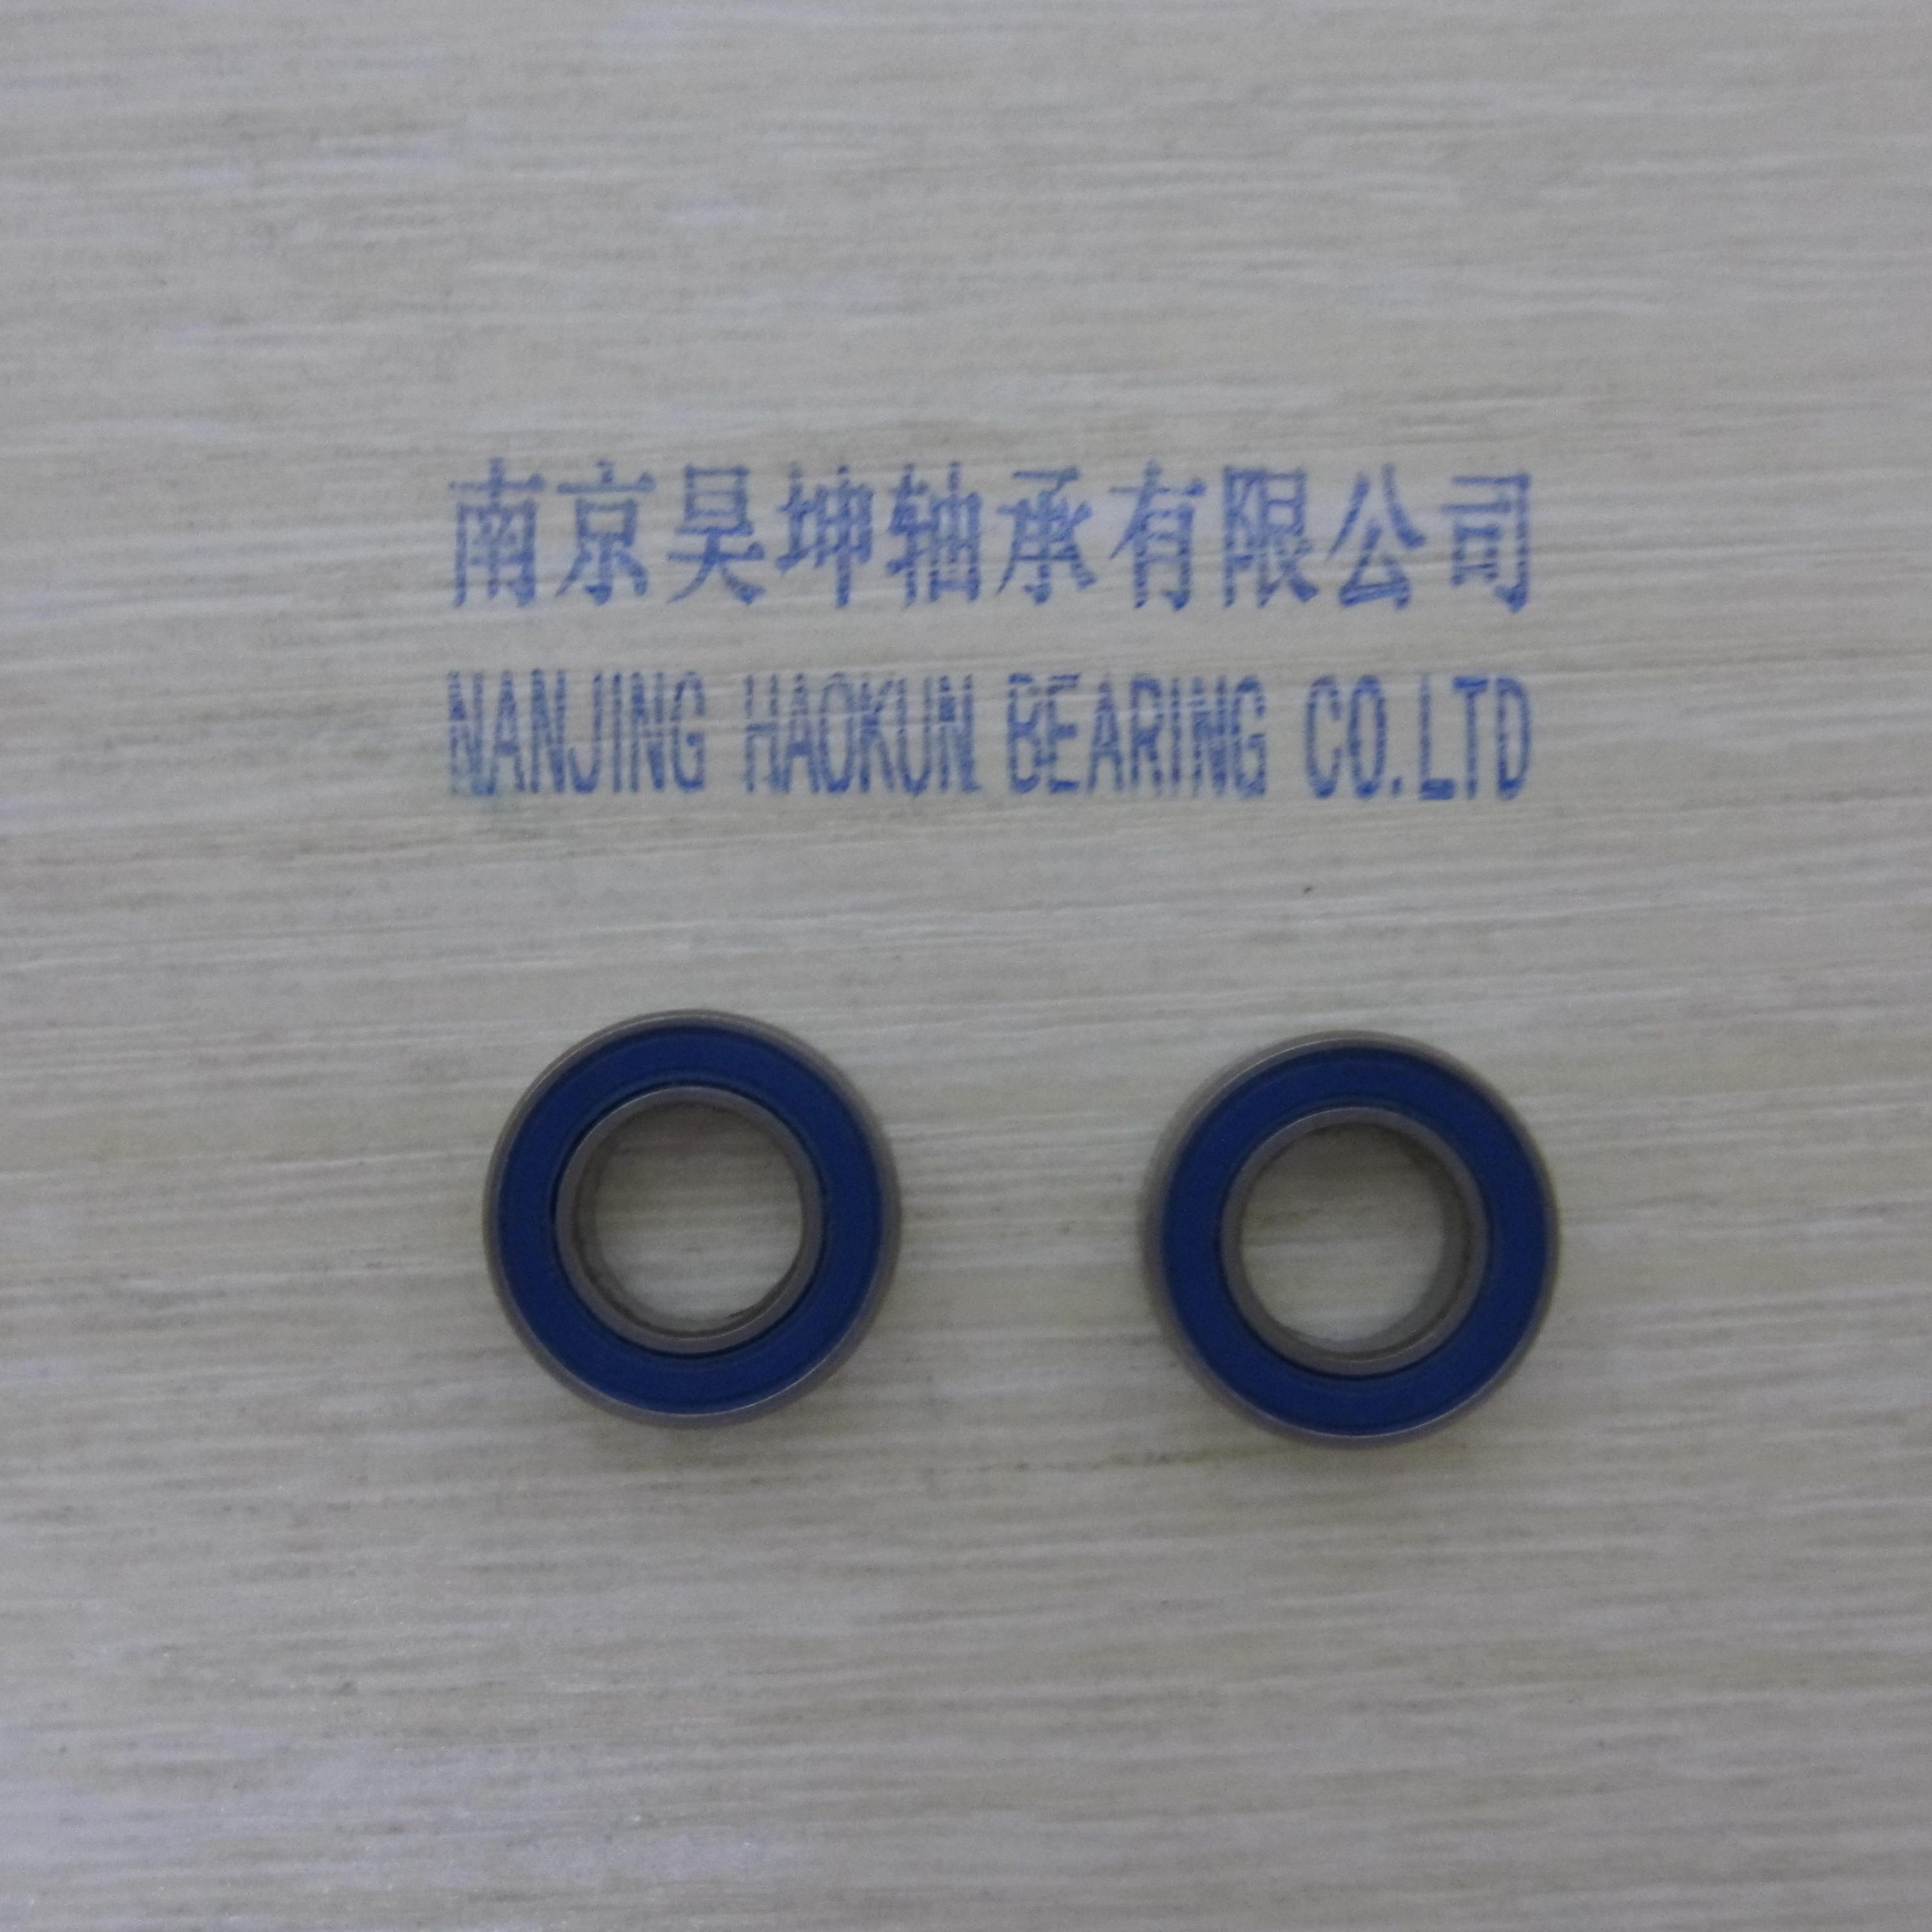 sc17287-2rs CB S17287-2RS CB hybrid 17287-2rs wheel hub bearing stainless steel Si3N4 hybrid ceramic bearing 17*28*7mm free shipping wheel hub bearing 15267 2rs 15 26 7mm 15267 stainless steel si3n4 hybrid ceramic bearing